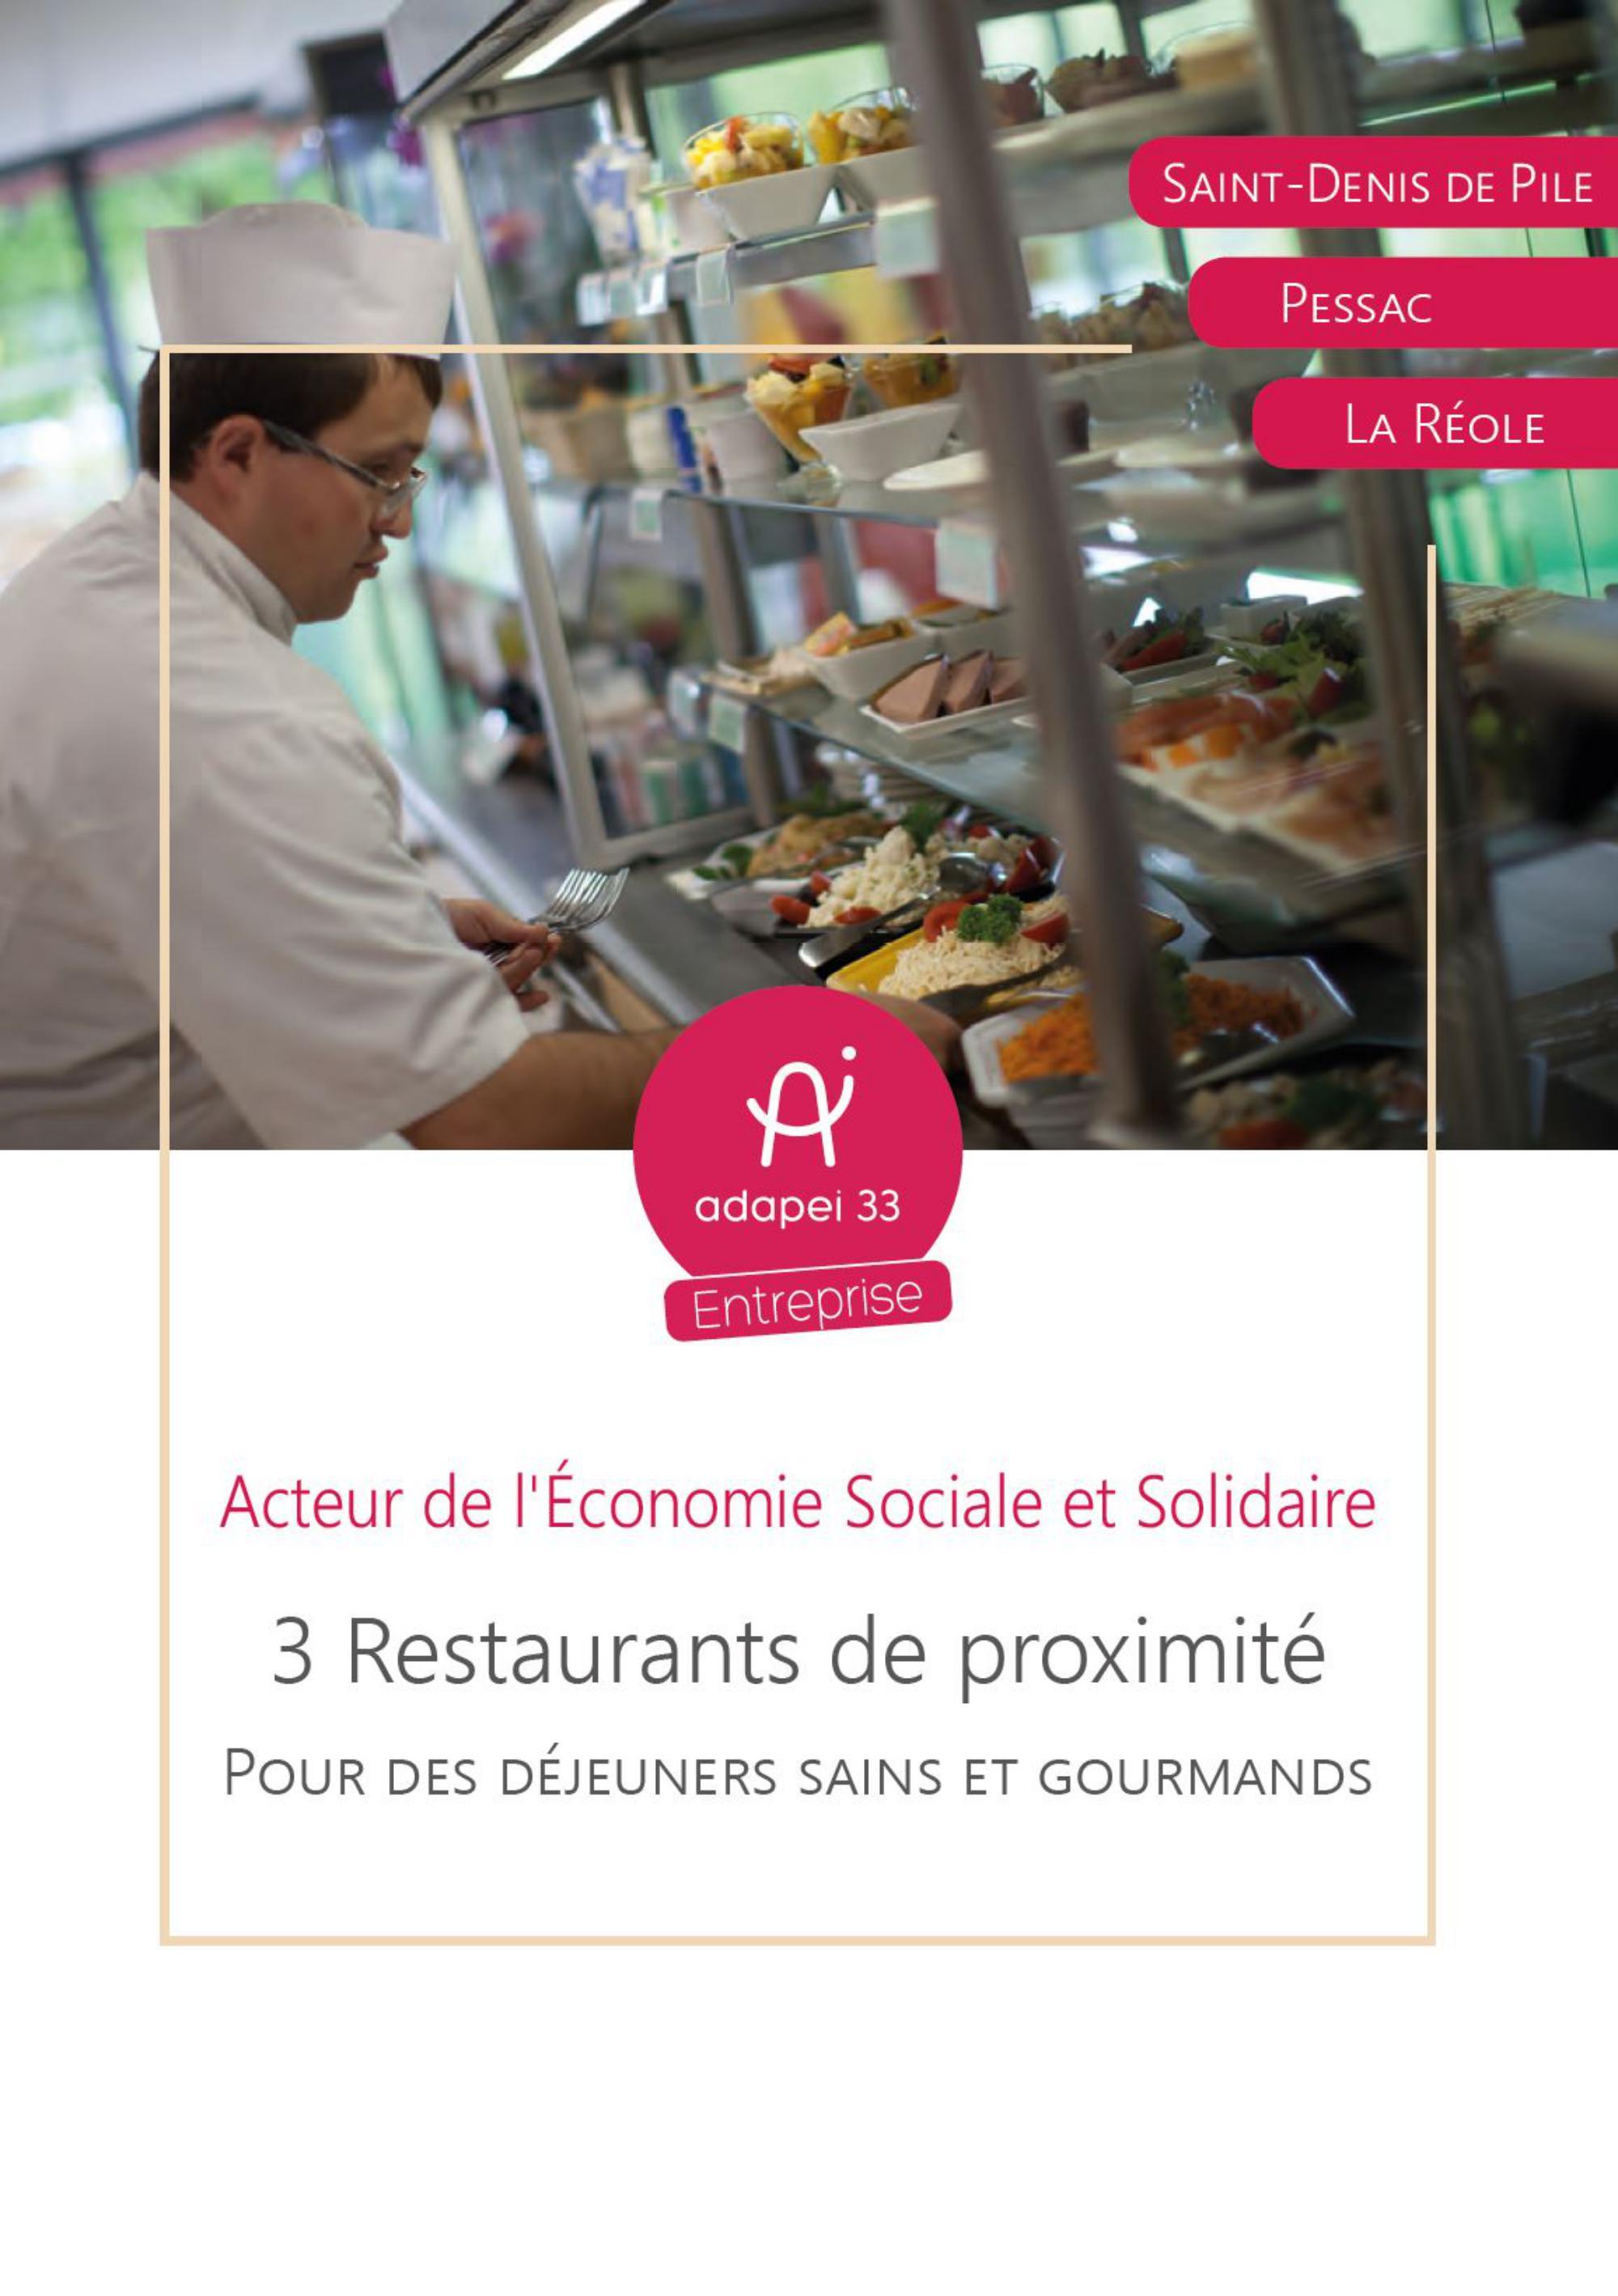 3 restaurants de proximité